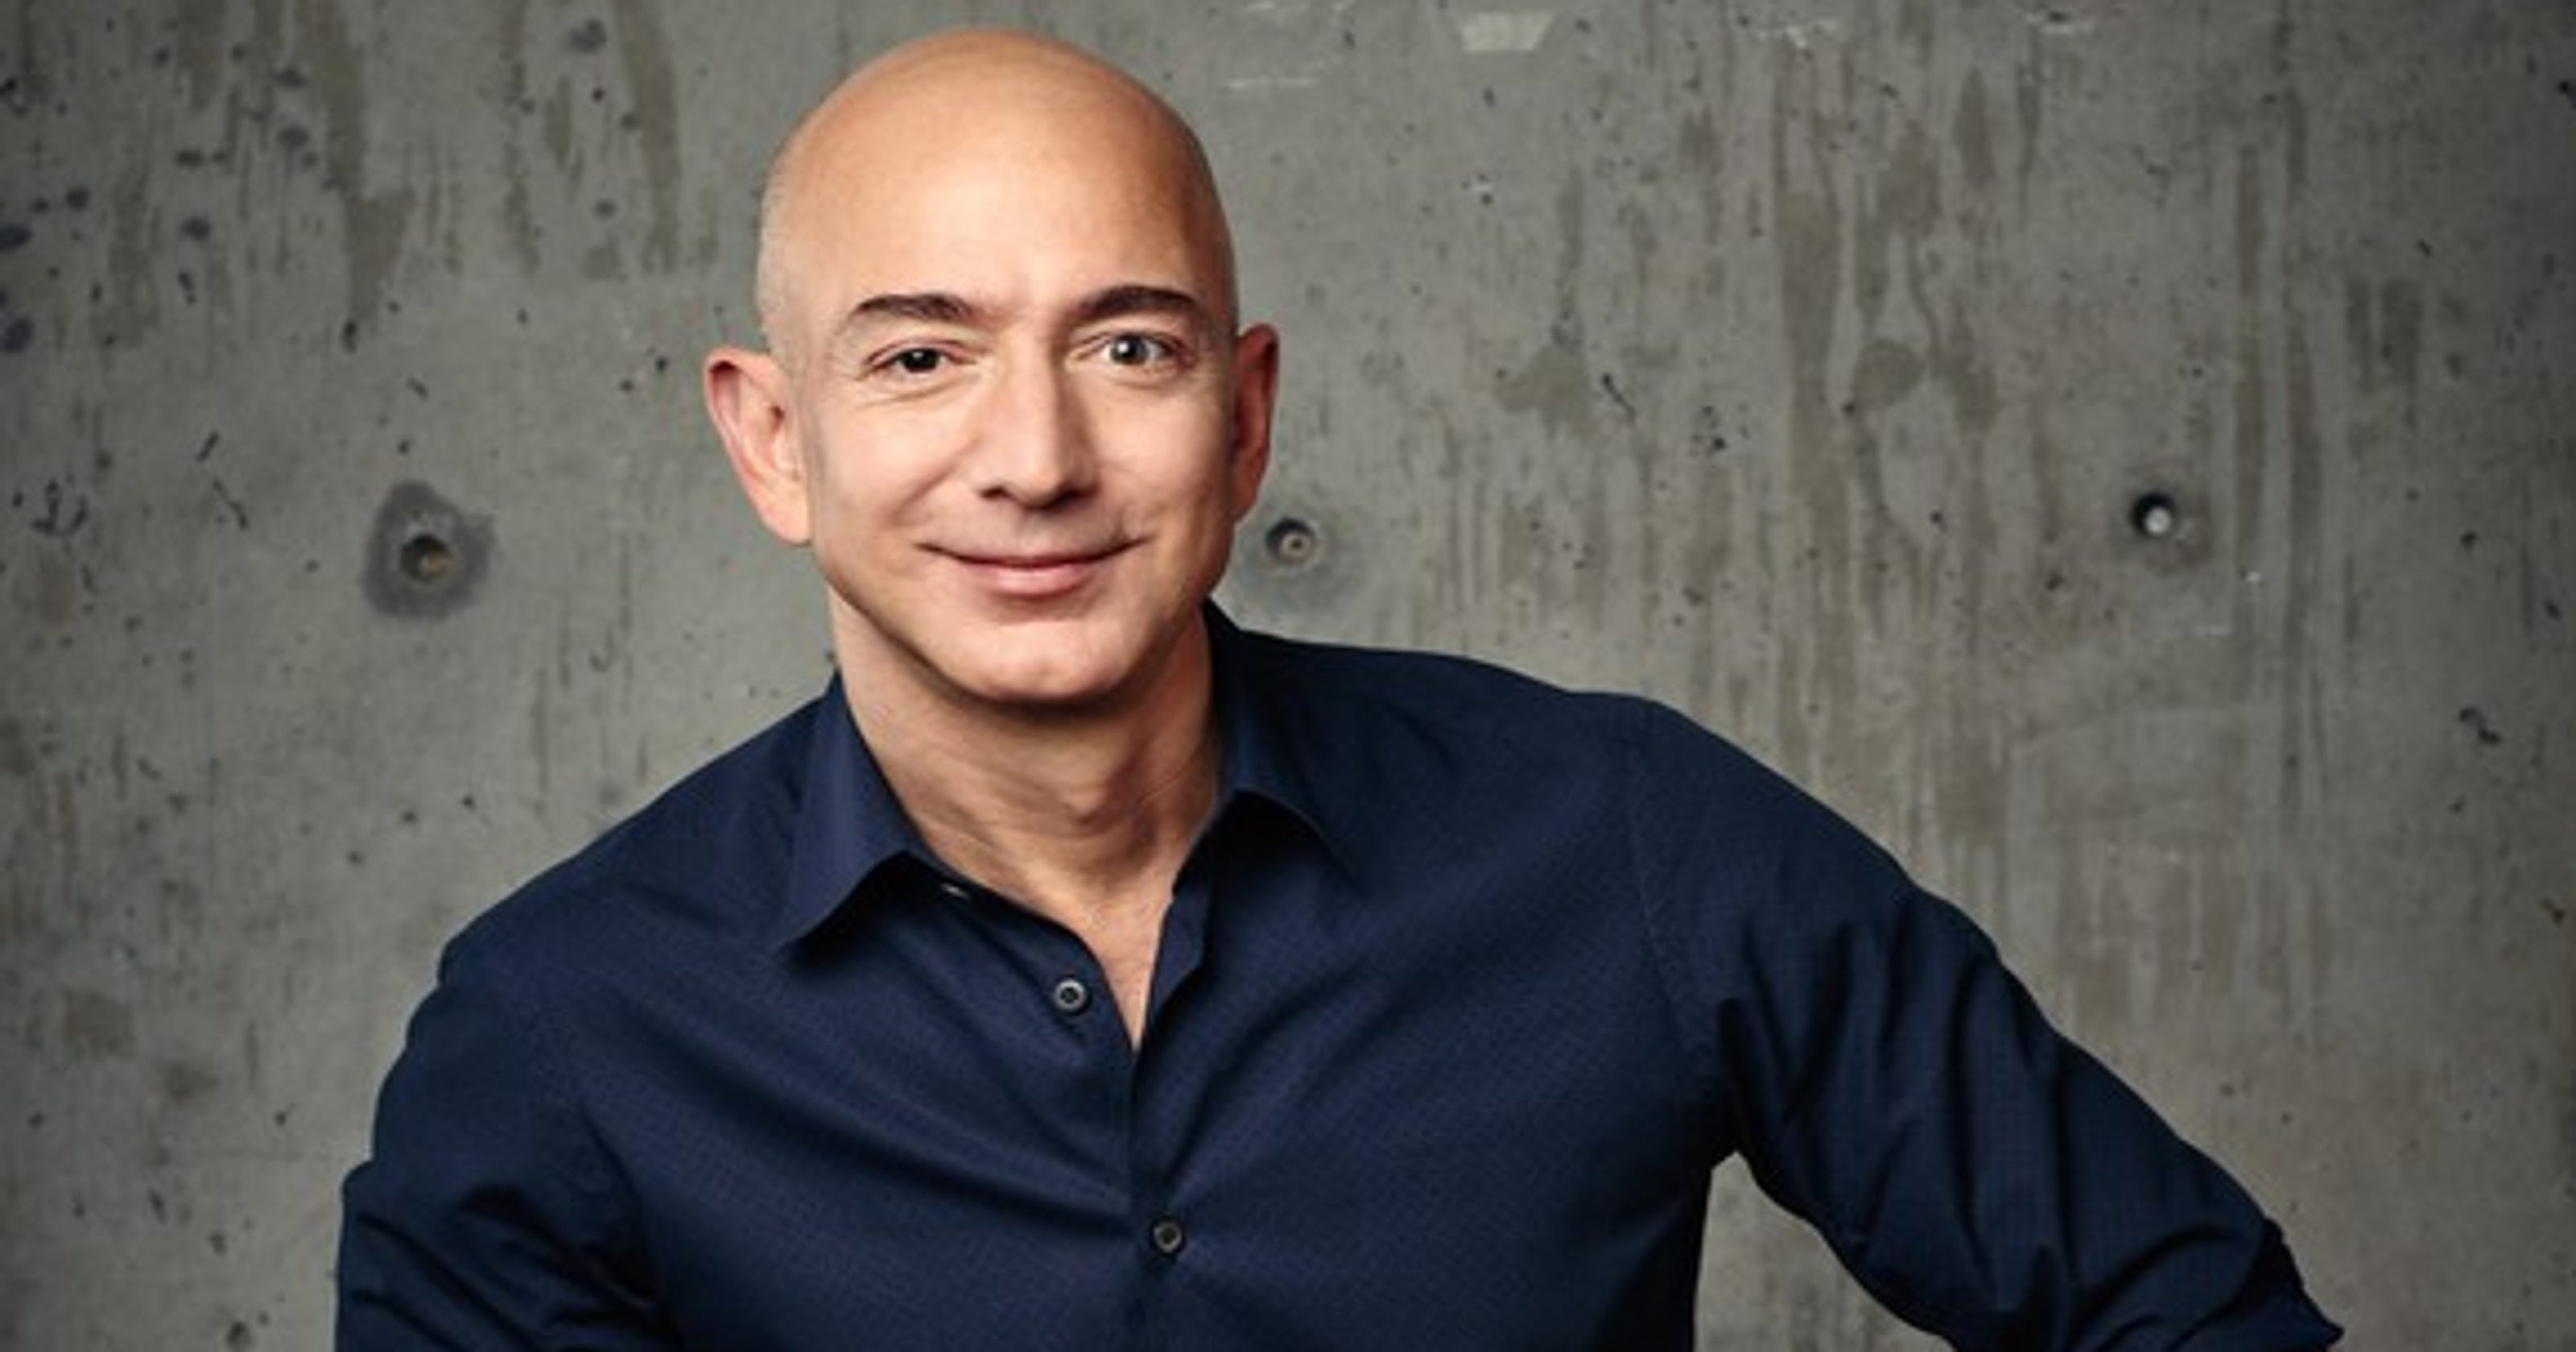 Jeff Bezos Tops Forbes 2018 Richest People List Donald Trump Plummets